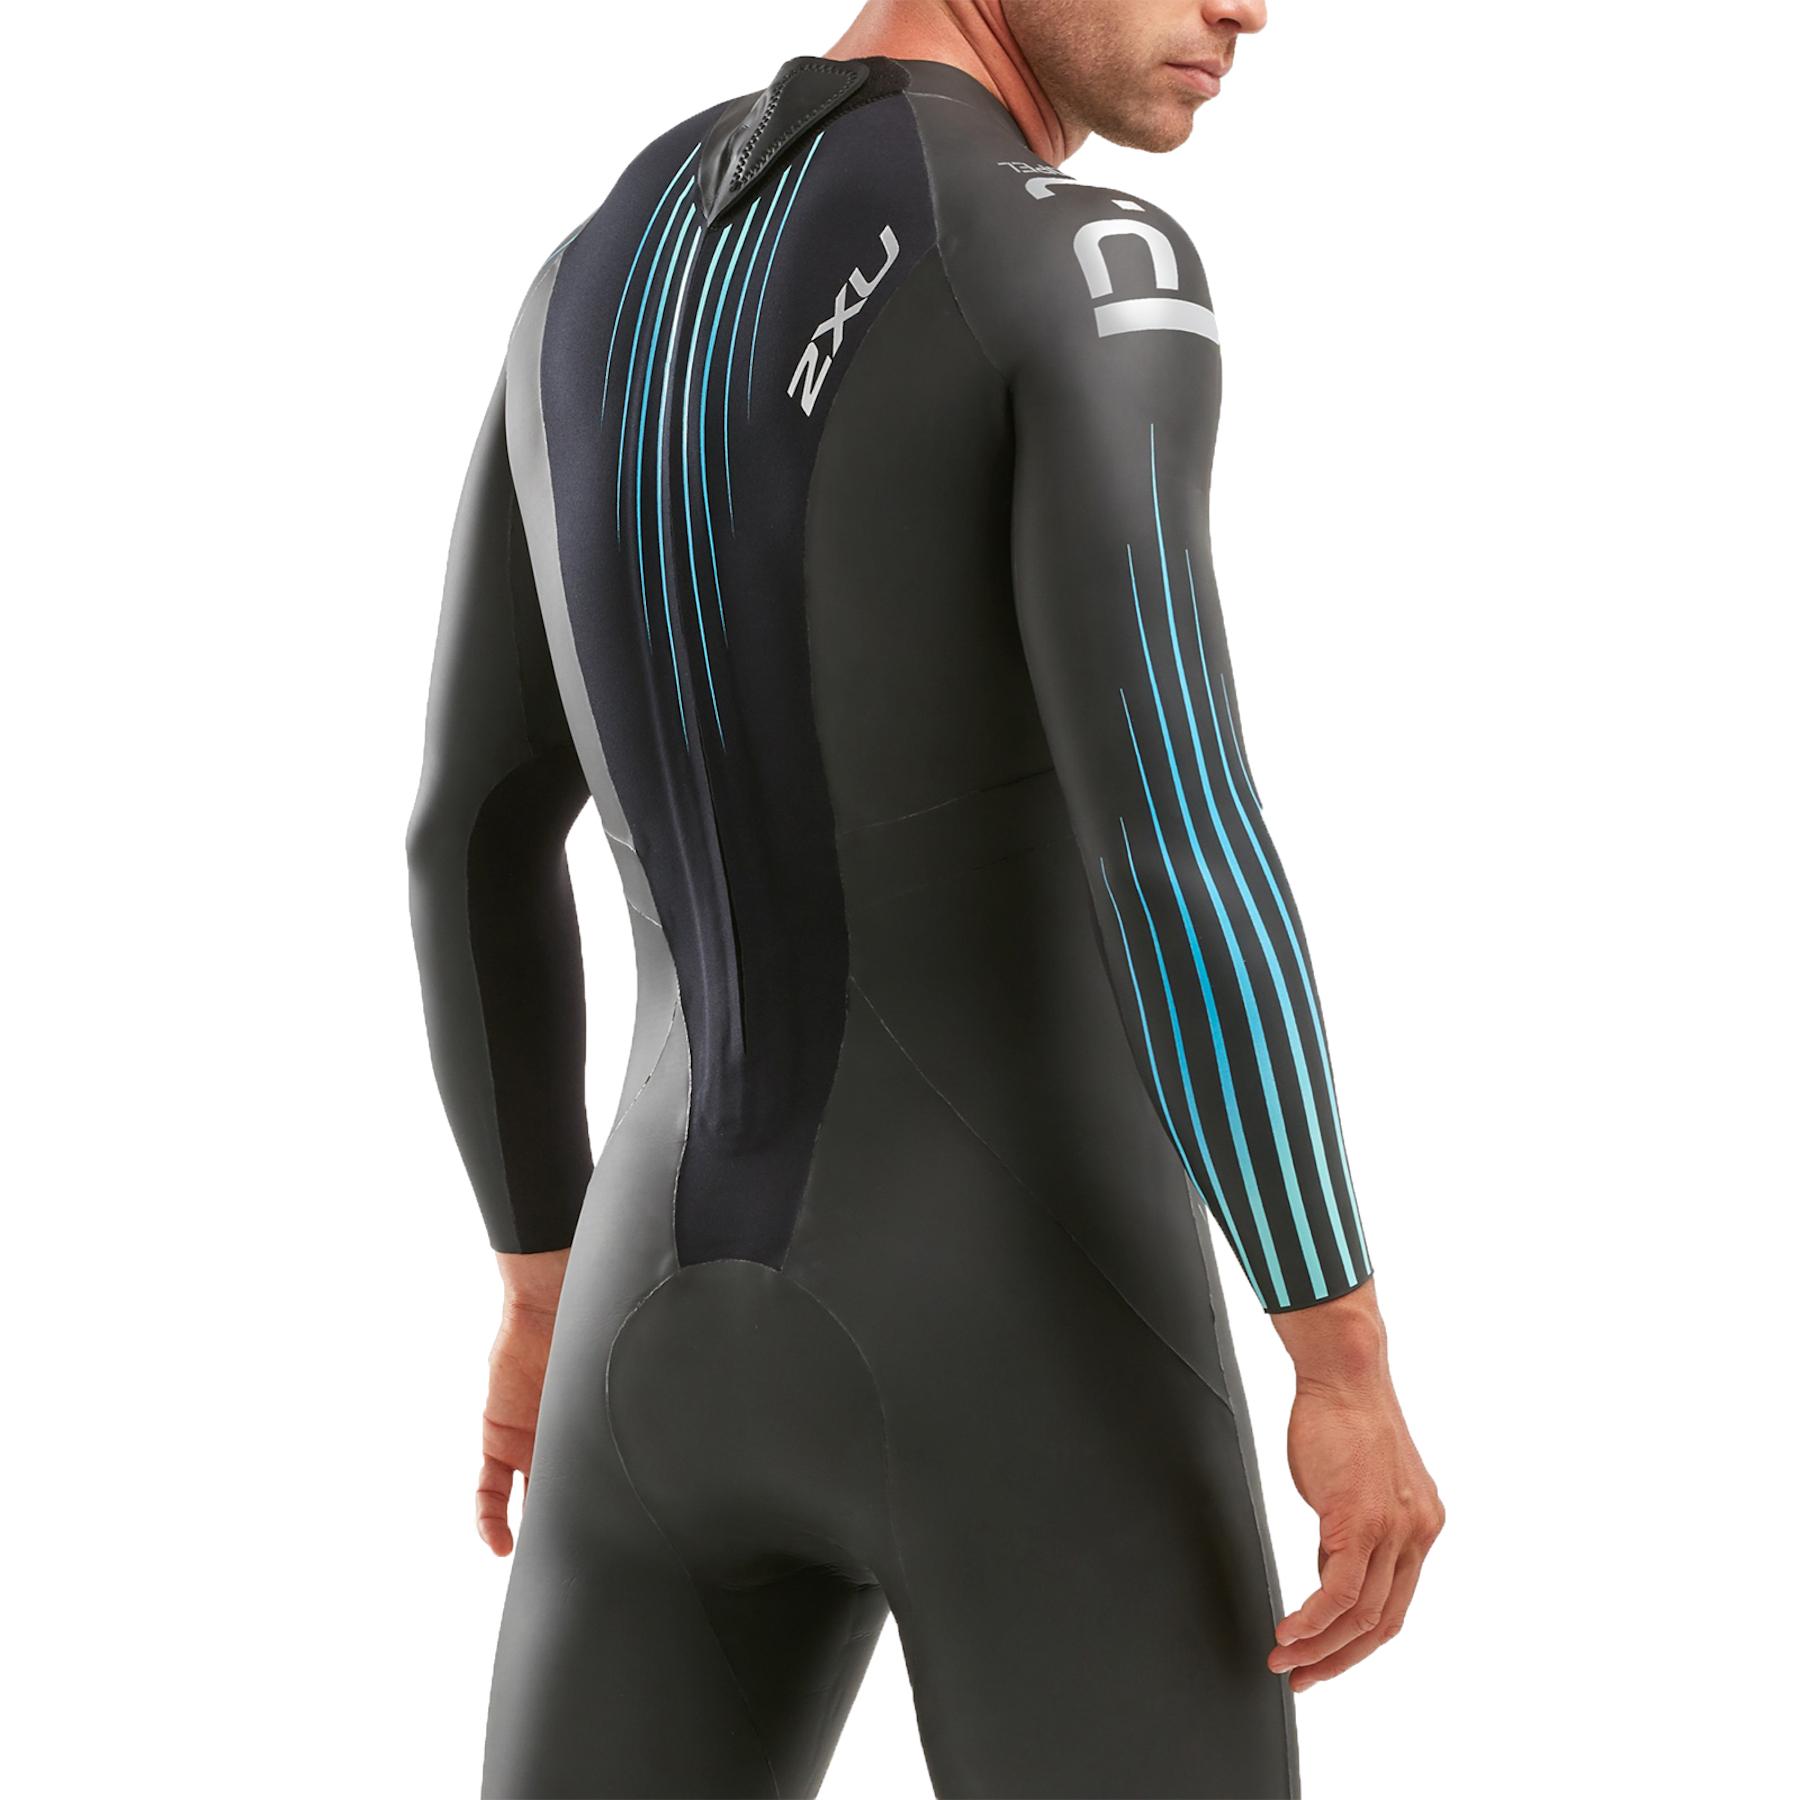 Image of 2XU P:1 Propel Wetsuit - black/blue ombre